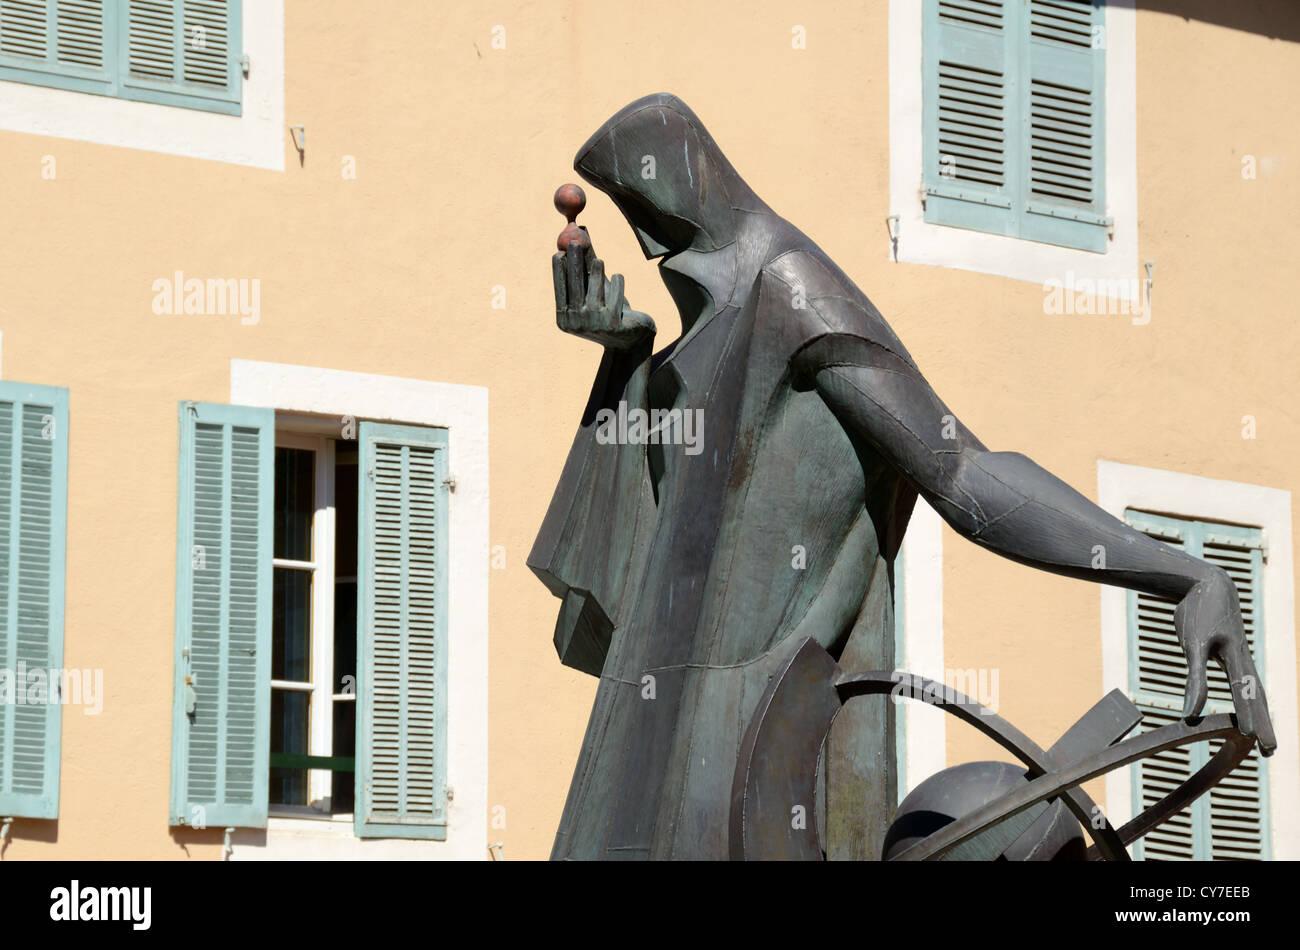 Contemporary Statue or Sculpture of Nostradamus Salon-de-Provence Provence France - Stock Image